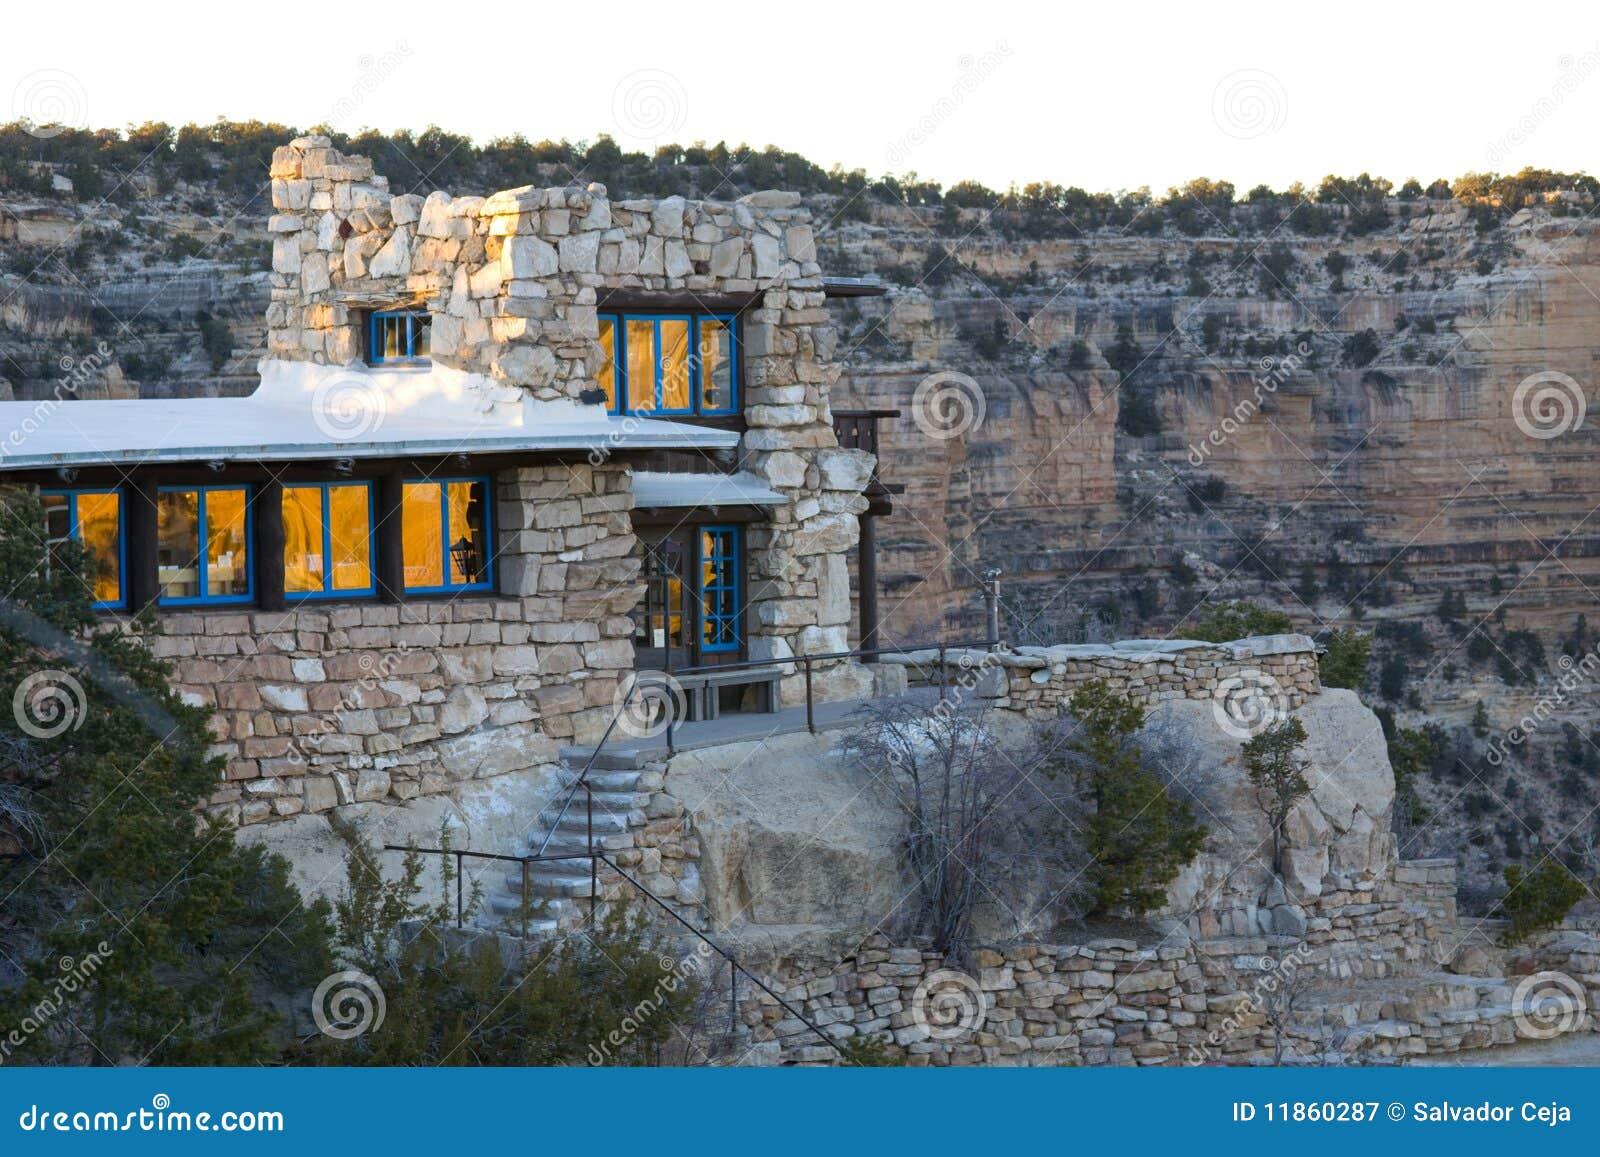 Grand canyon arizona house royalty free stock photography for Canyon house